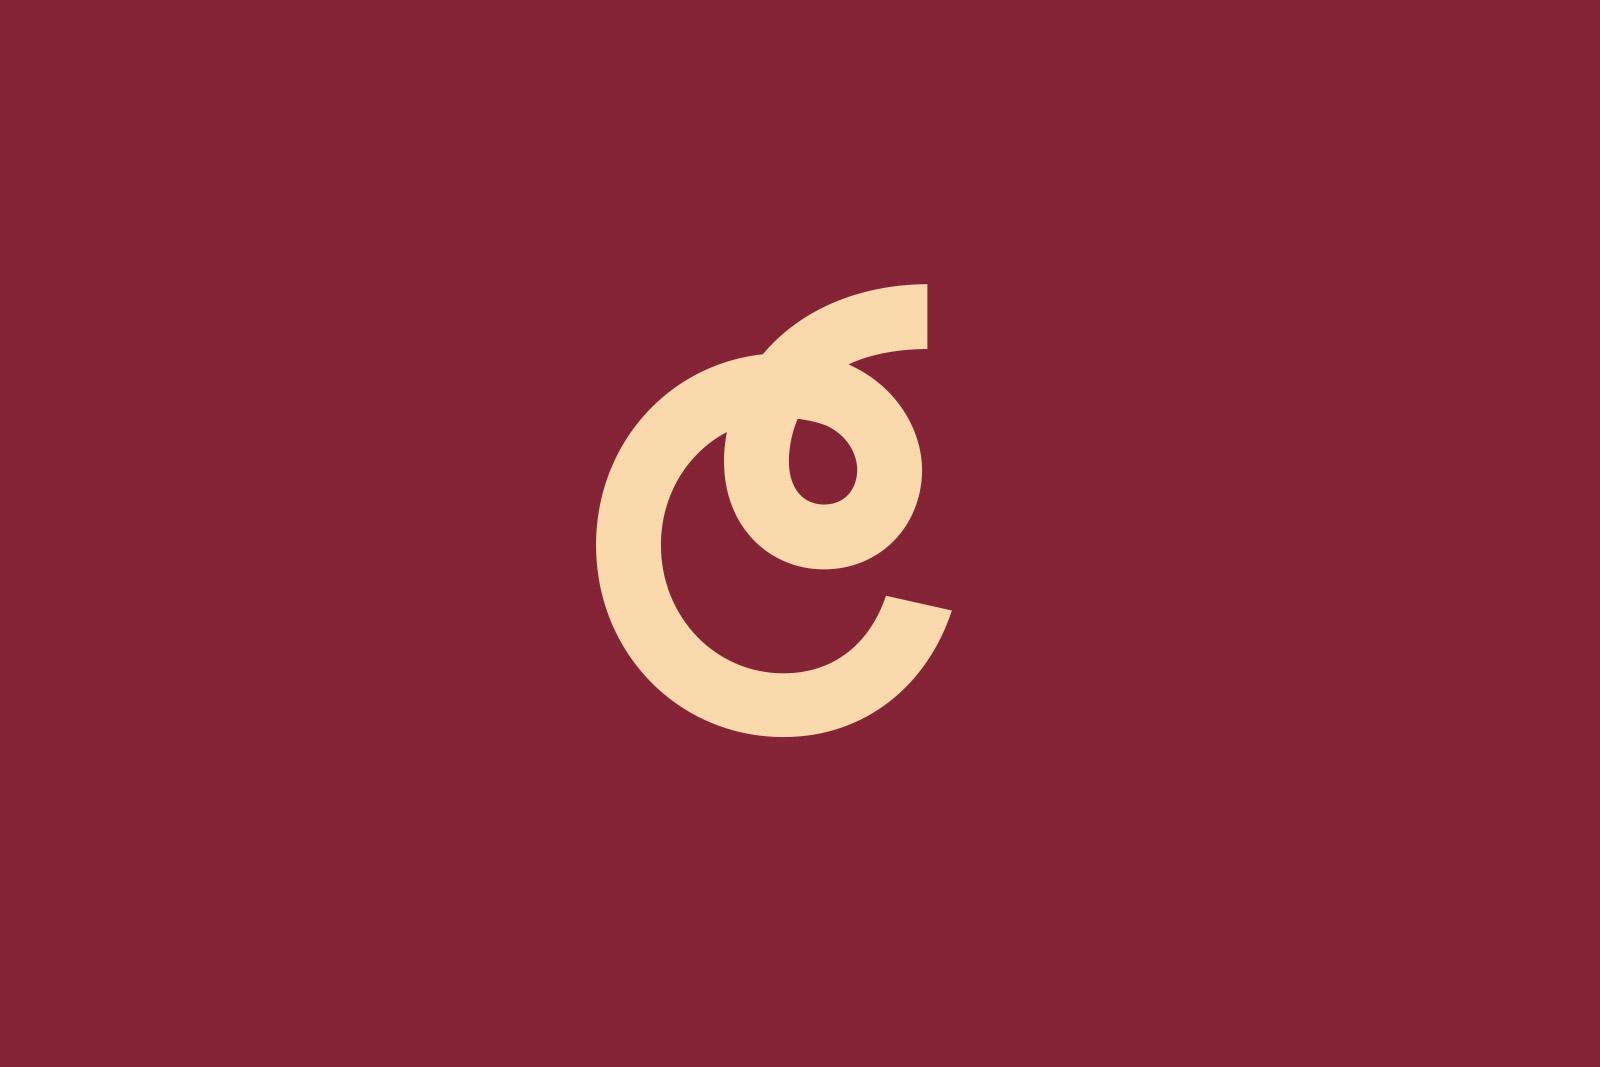 MyOwnCorks-Collserola-icon